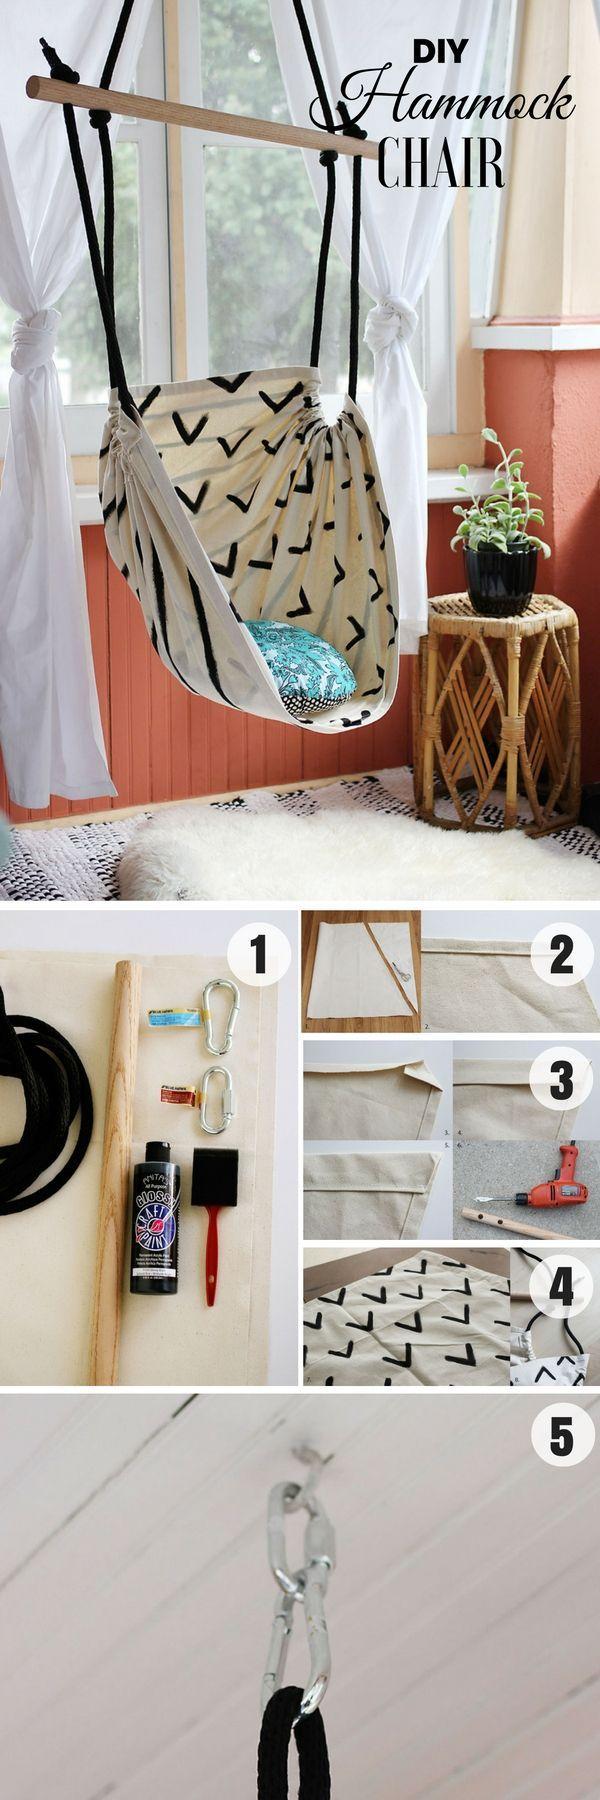 Diy ways to facelift your bedroom diy hammock hammock chair